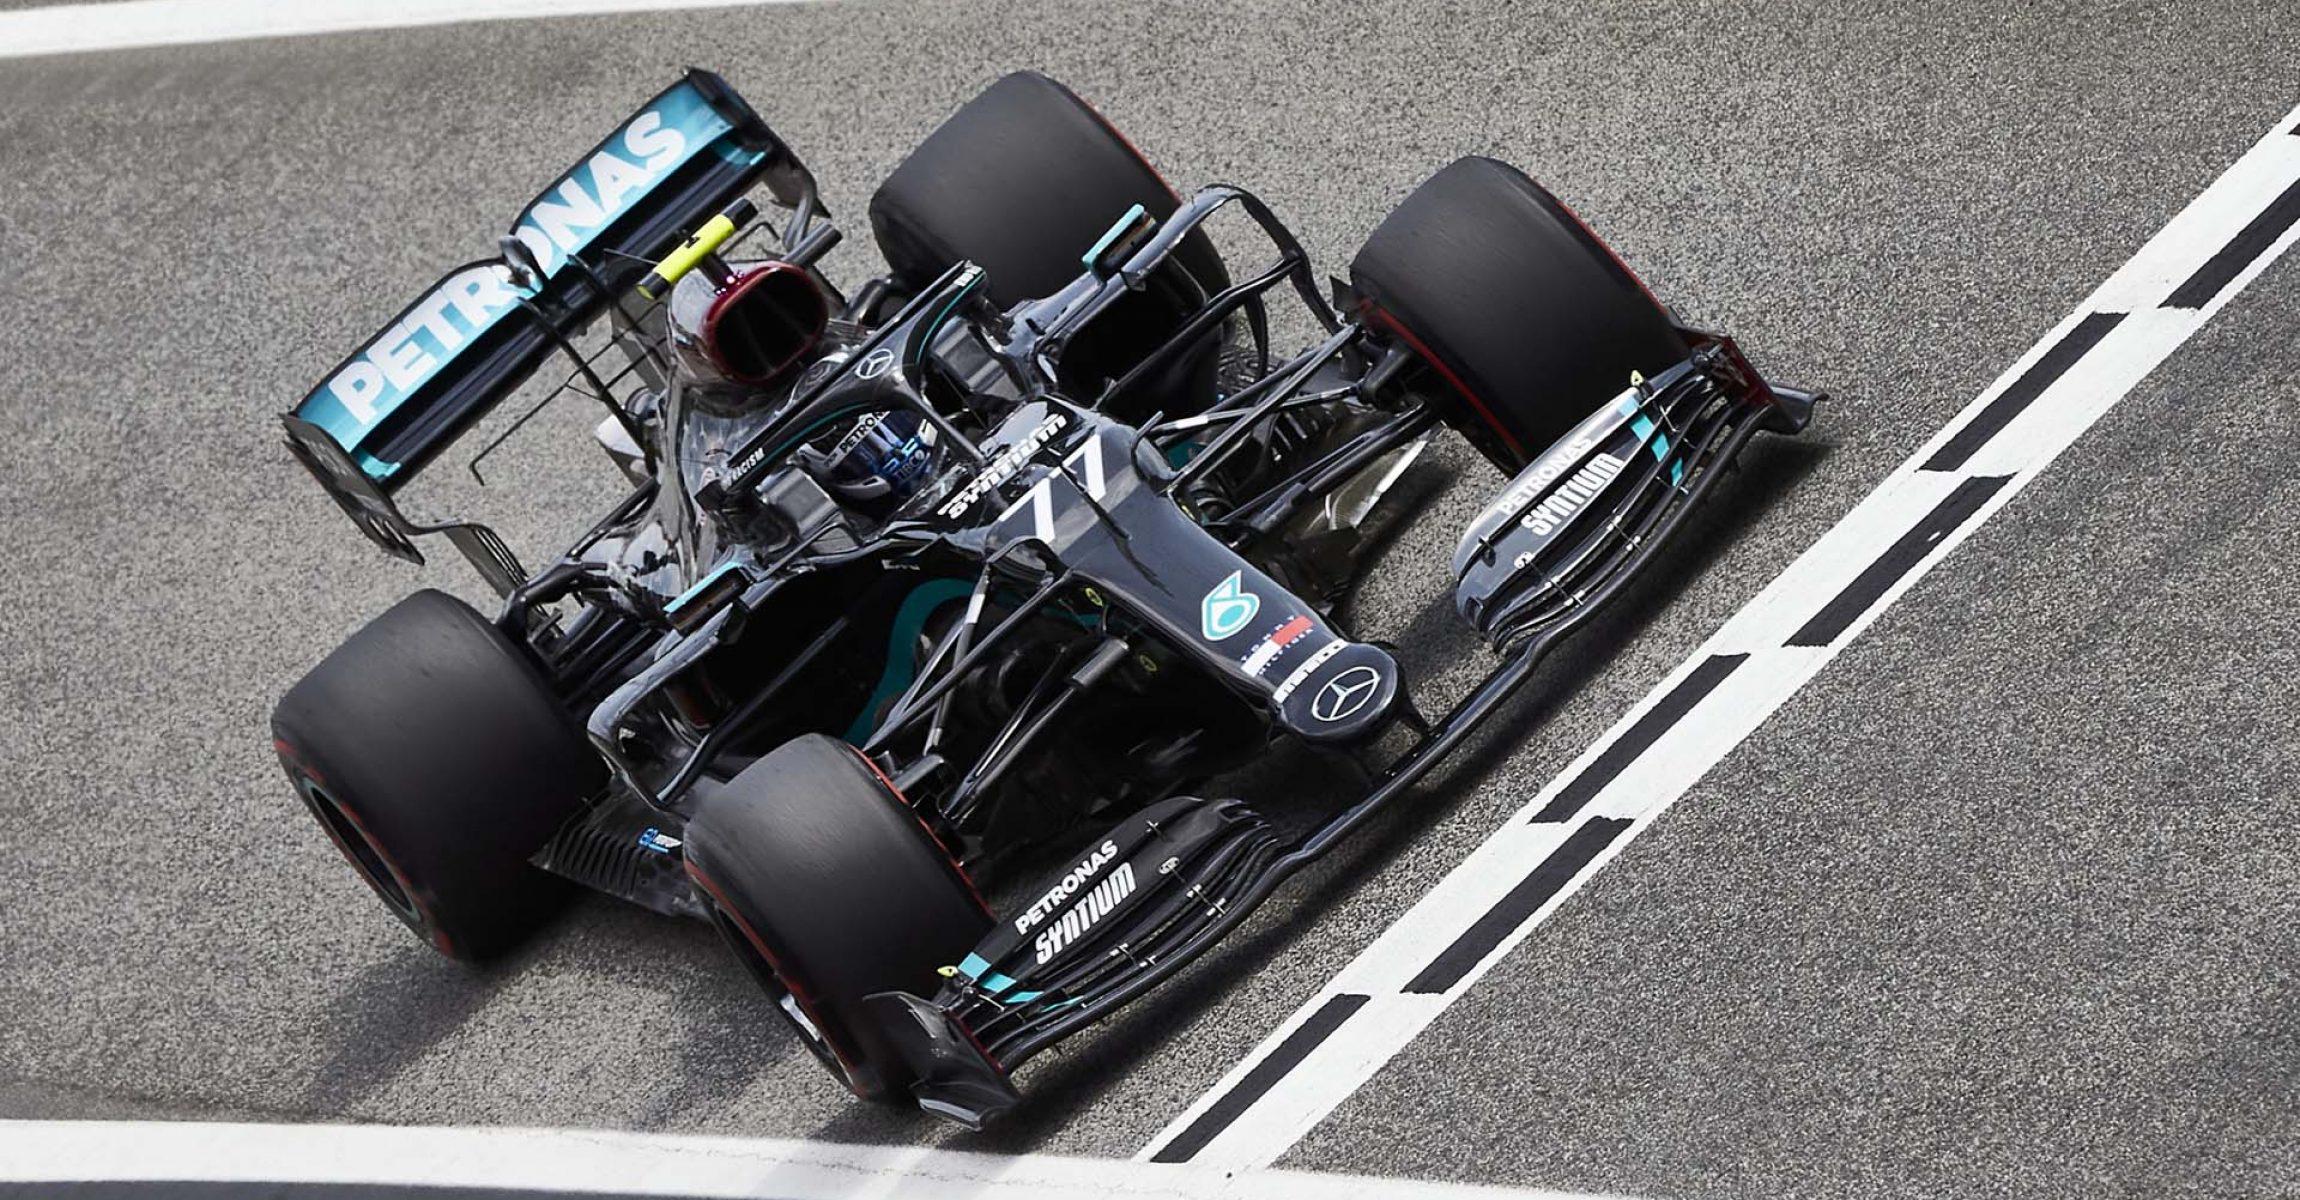 2020 Spanish Grand Prix, Friday - Steve Etherington Valtteri Bottas Mercedes